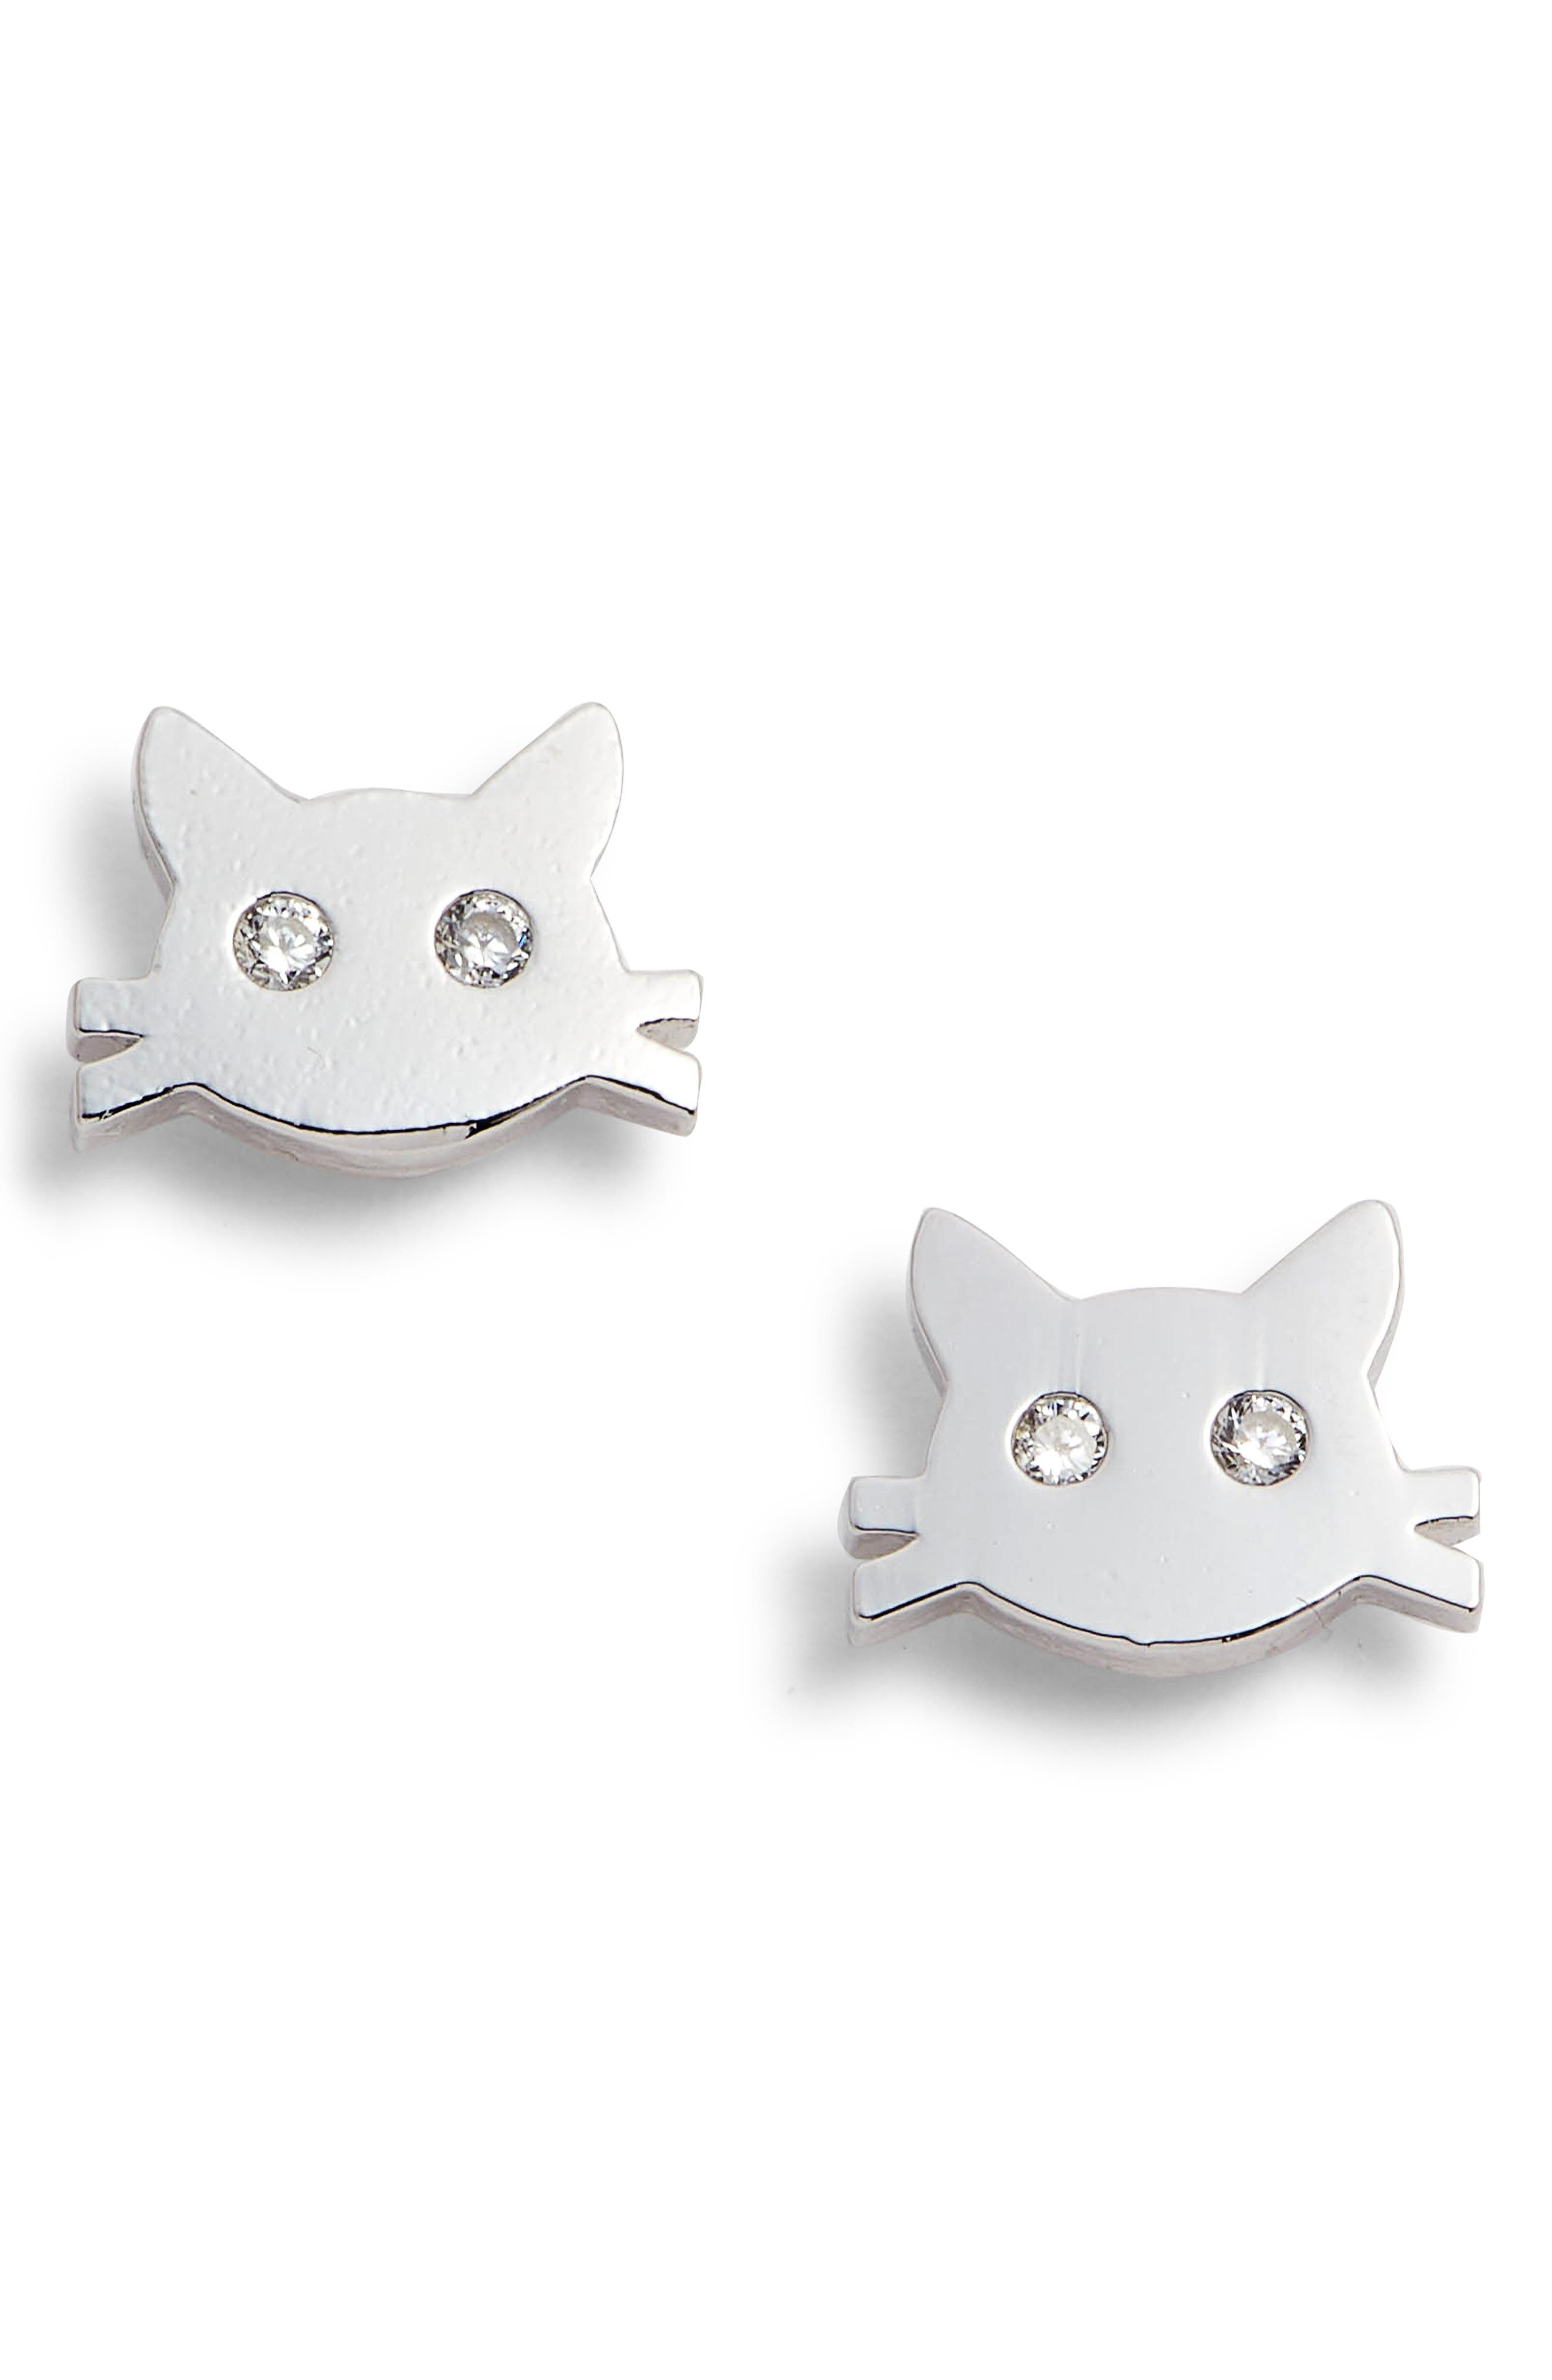 Crystal Cat Stud Earrings,                         Main,                         color, SILVER